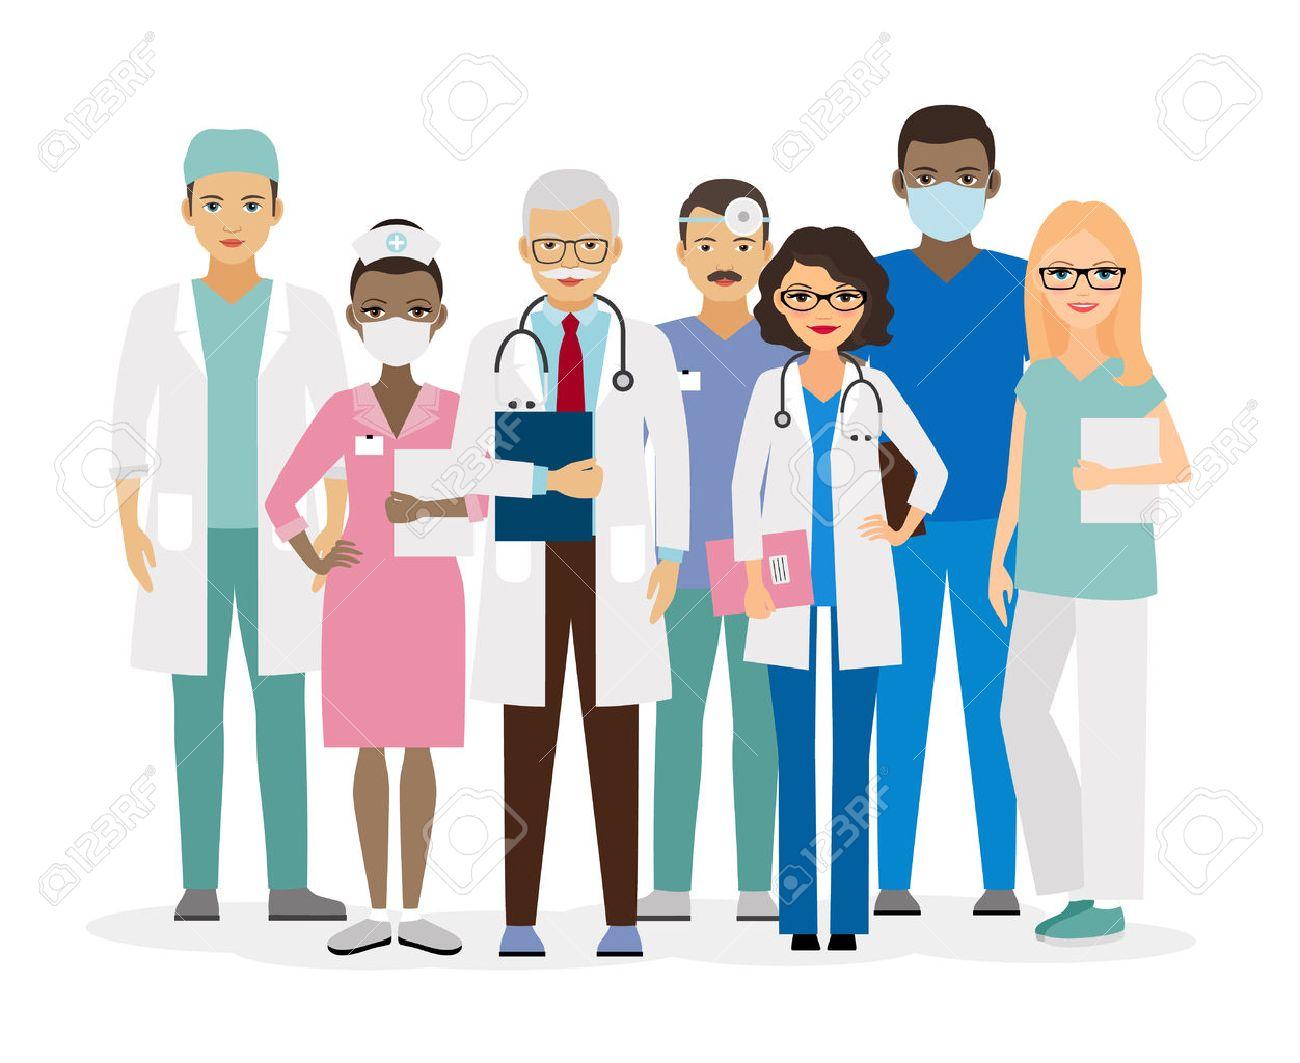 Medical team. Group of hospital workers illustration - 57502643